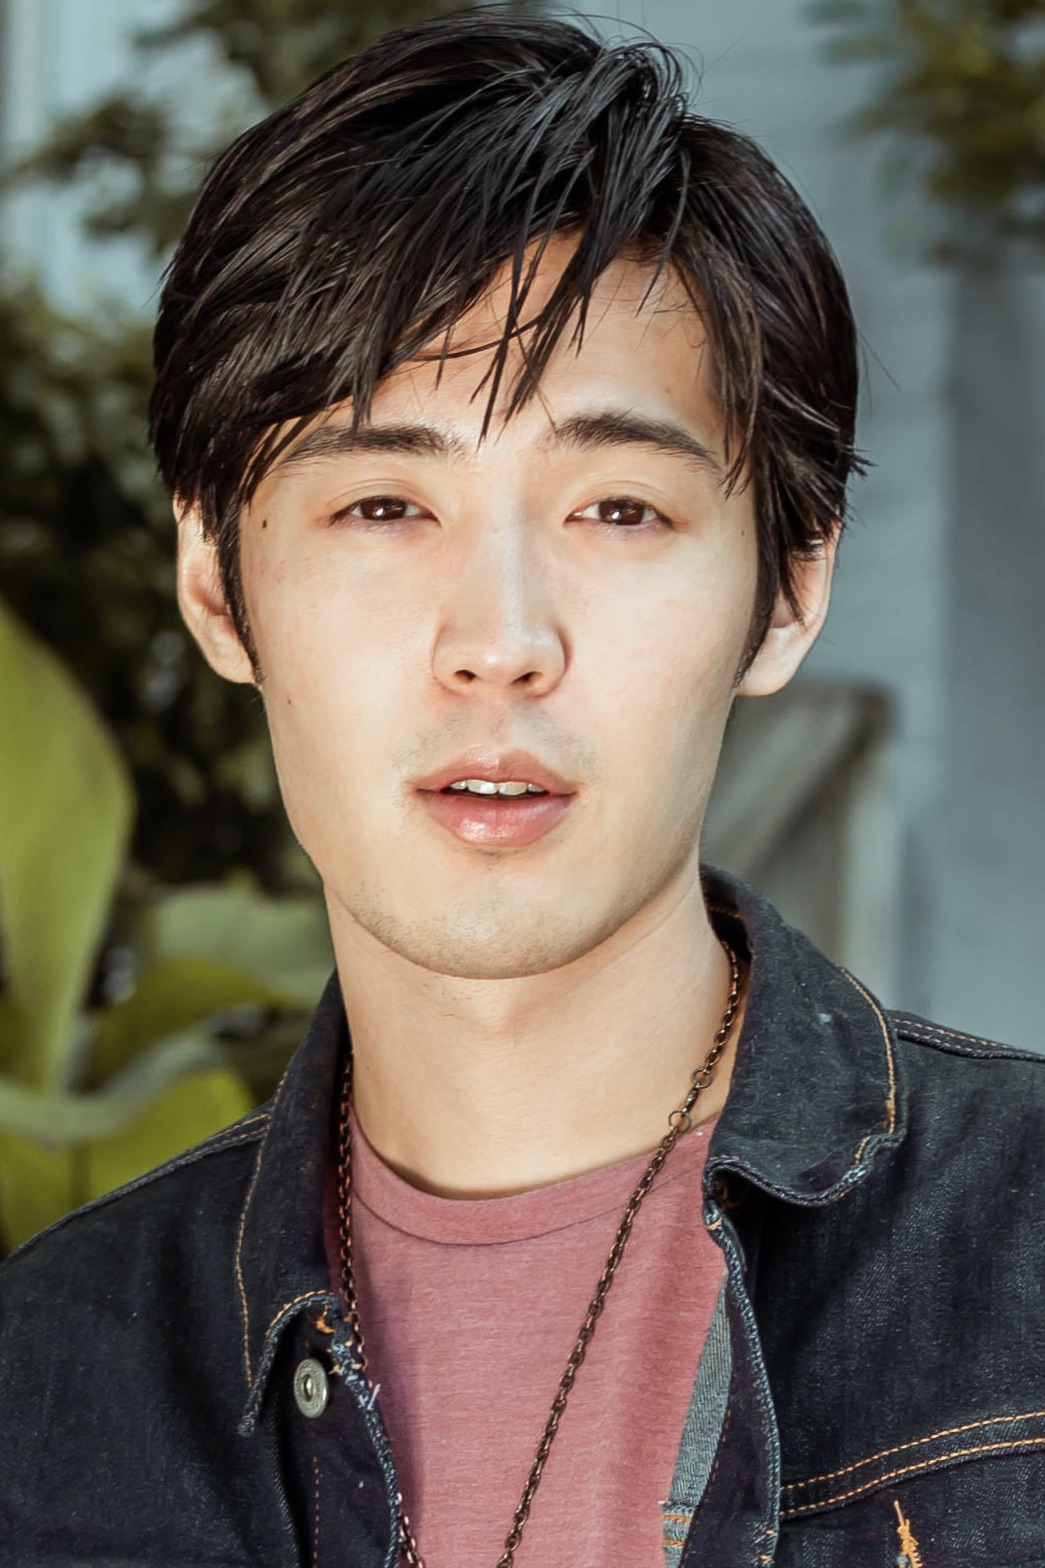 André_Dae_Kim